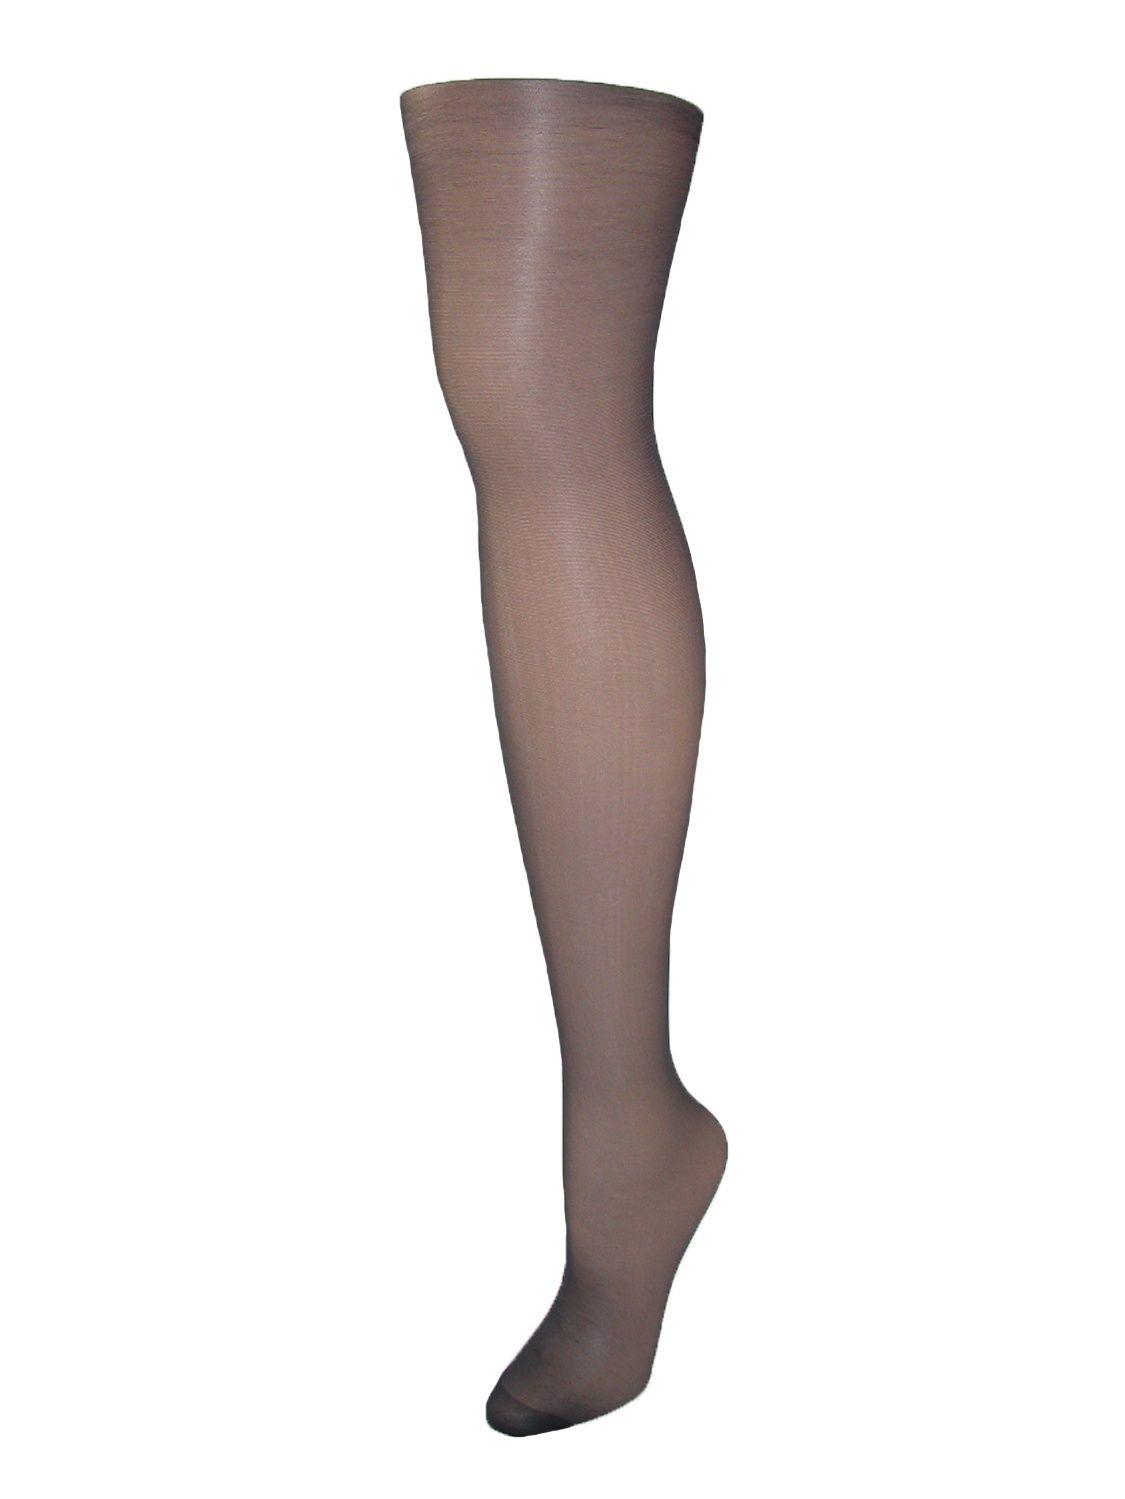 dda770090ef Silk Reflections Womens Plus-Size Control Top Enhanced Toe Pantyhose#Womens,  #Size, #Silk